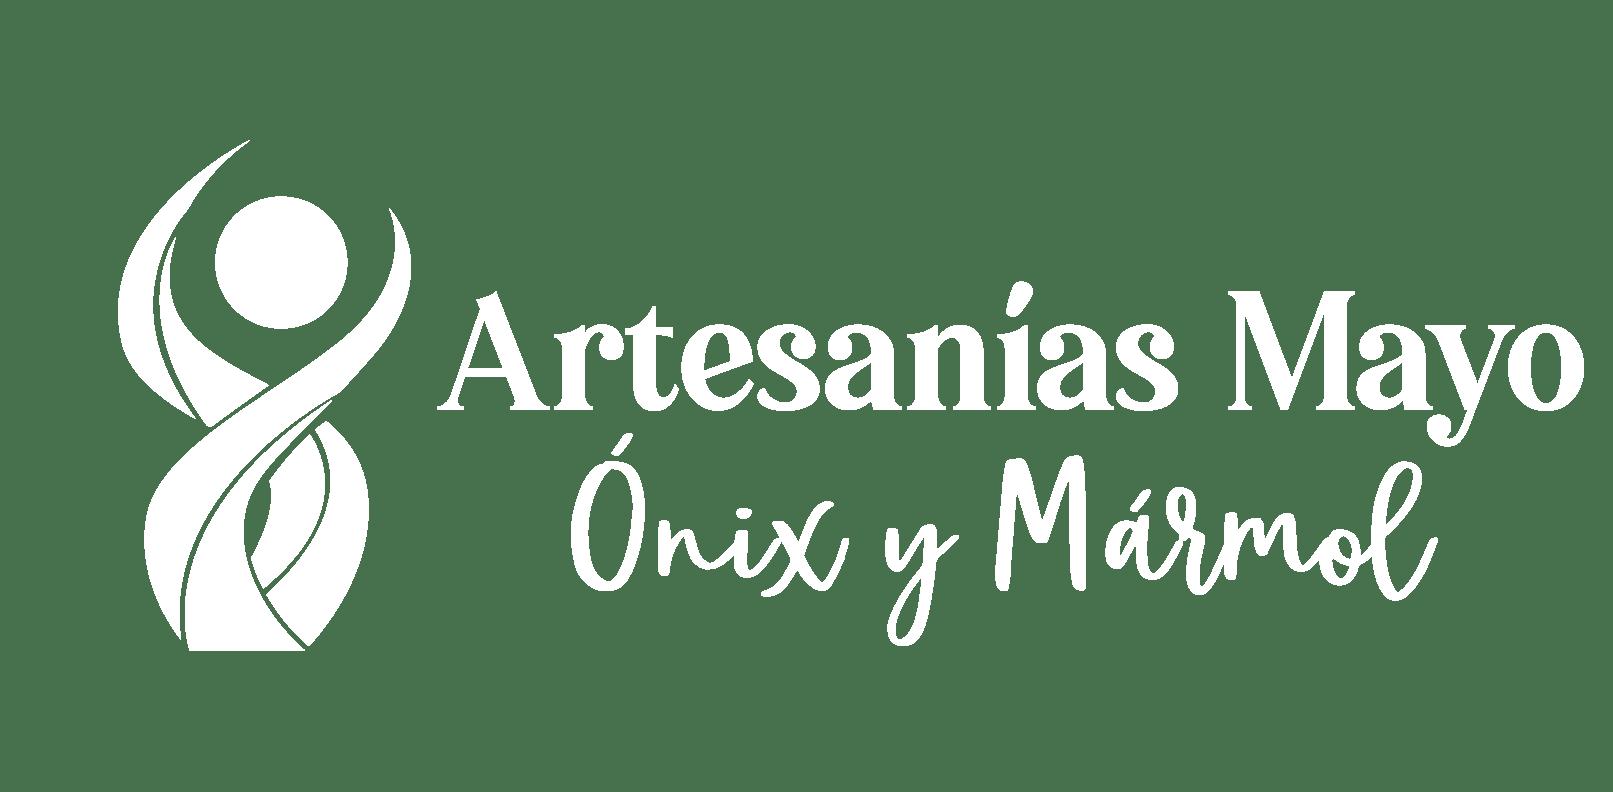 Artesanías Mayo